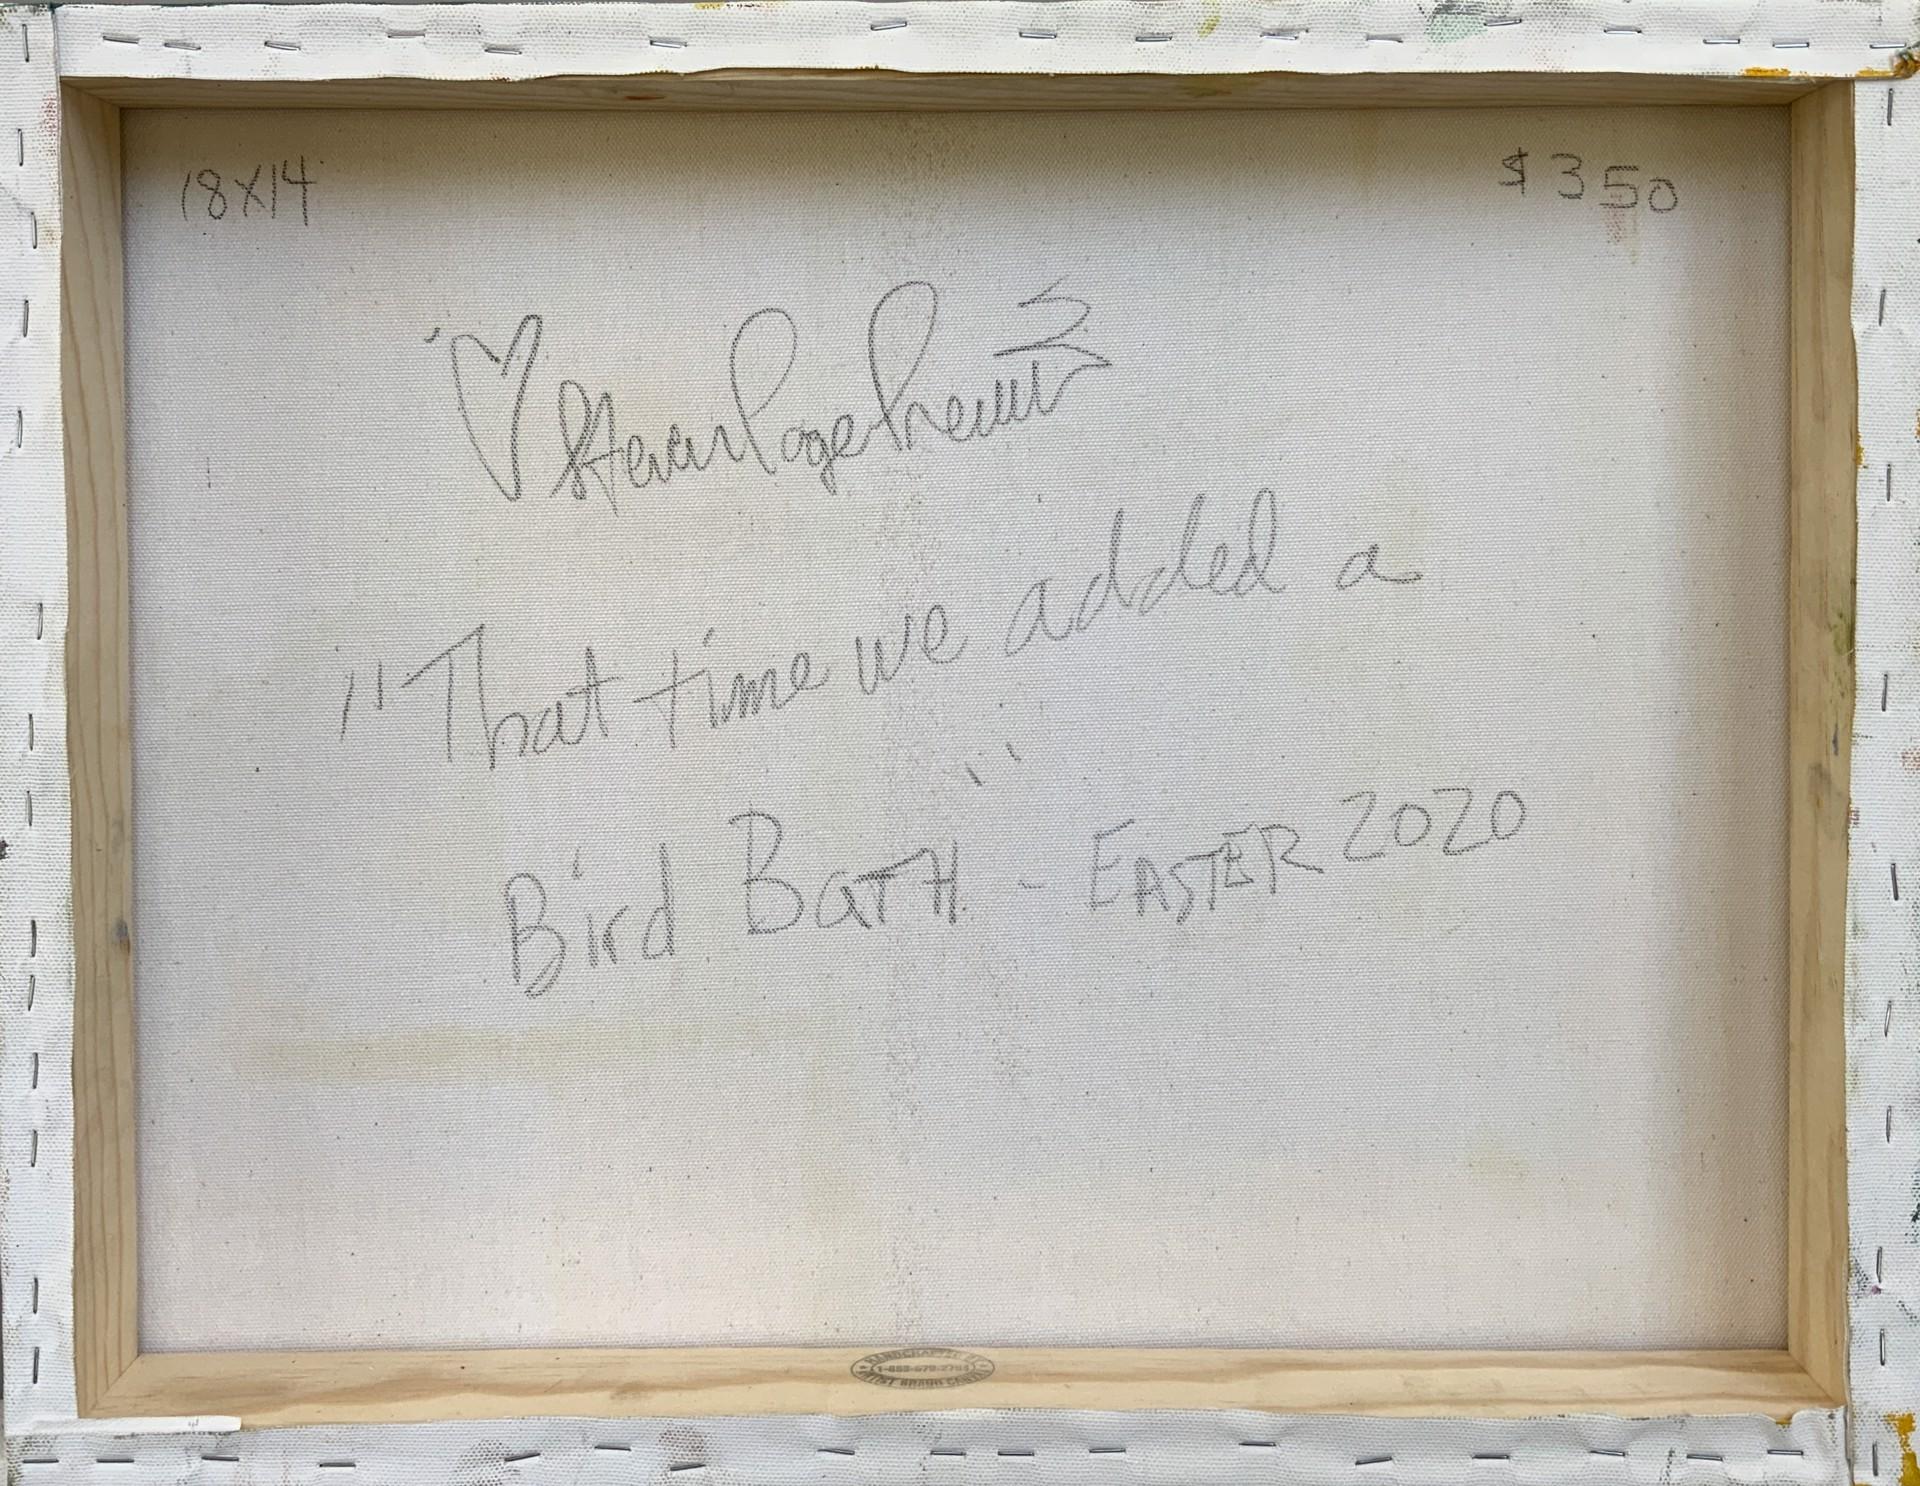 That Time We Added a Bird Bath by Steven Page Prewitt